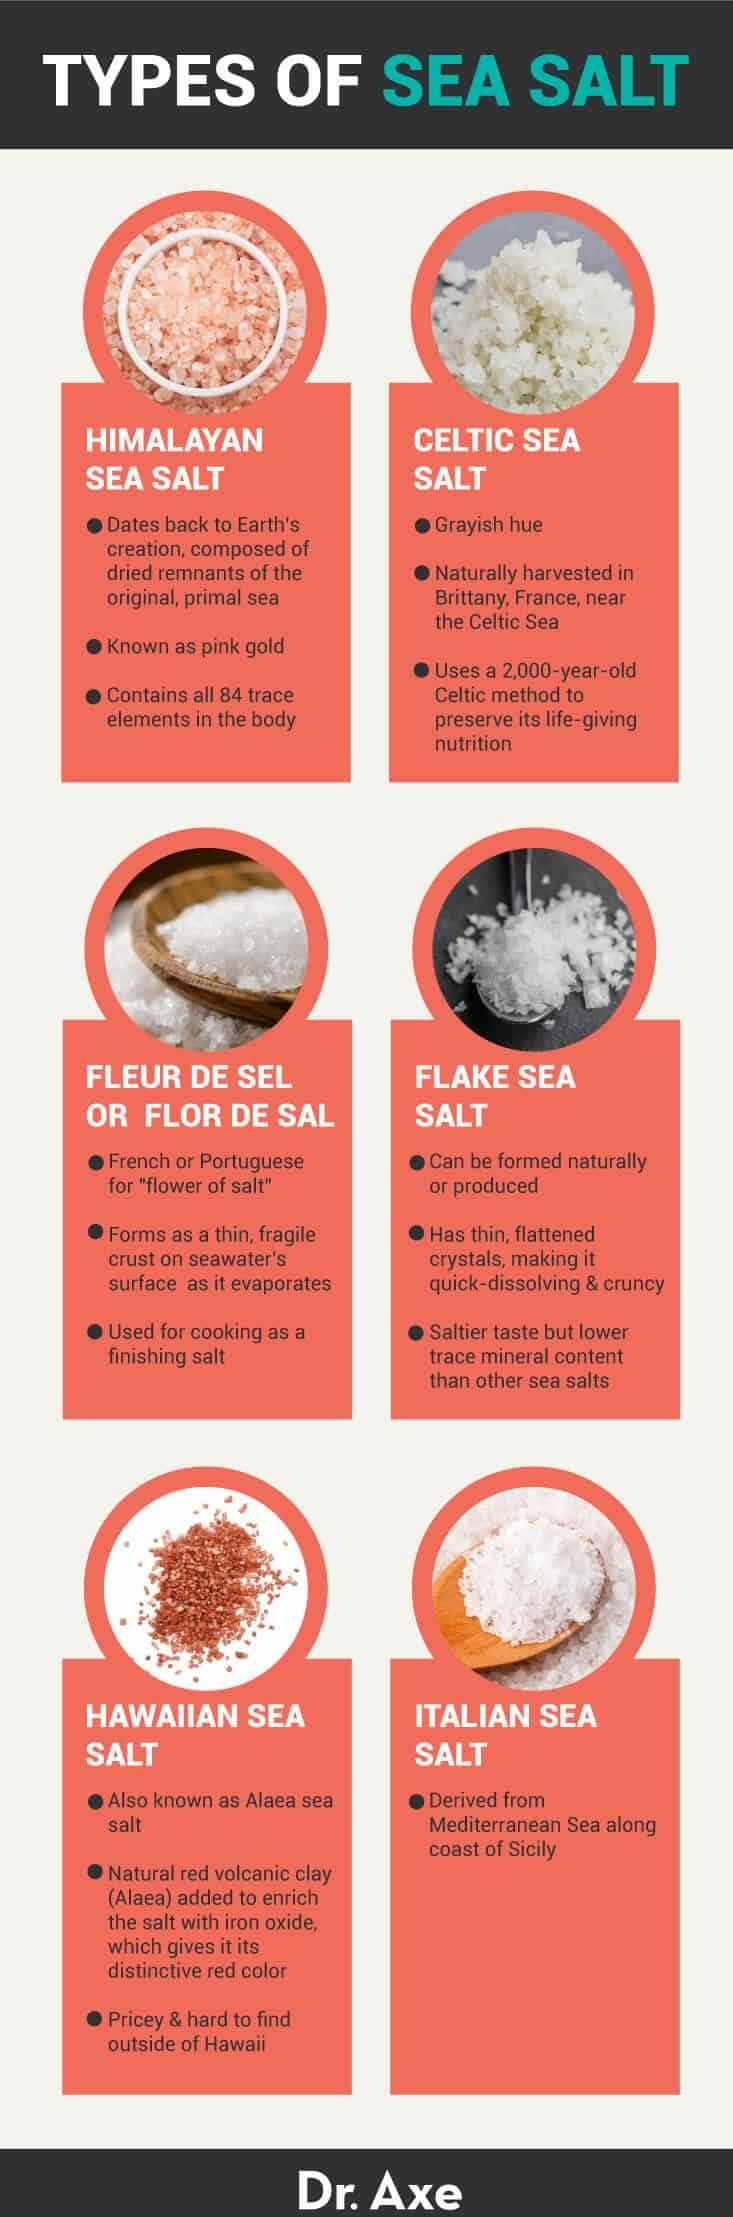 Types of sea salt - Dr. Axe